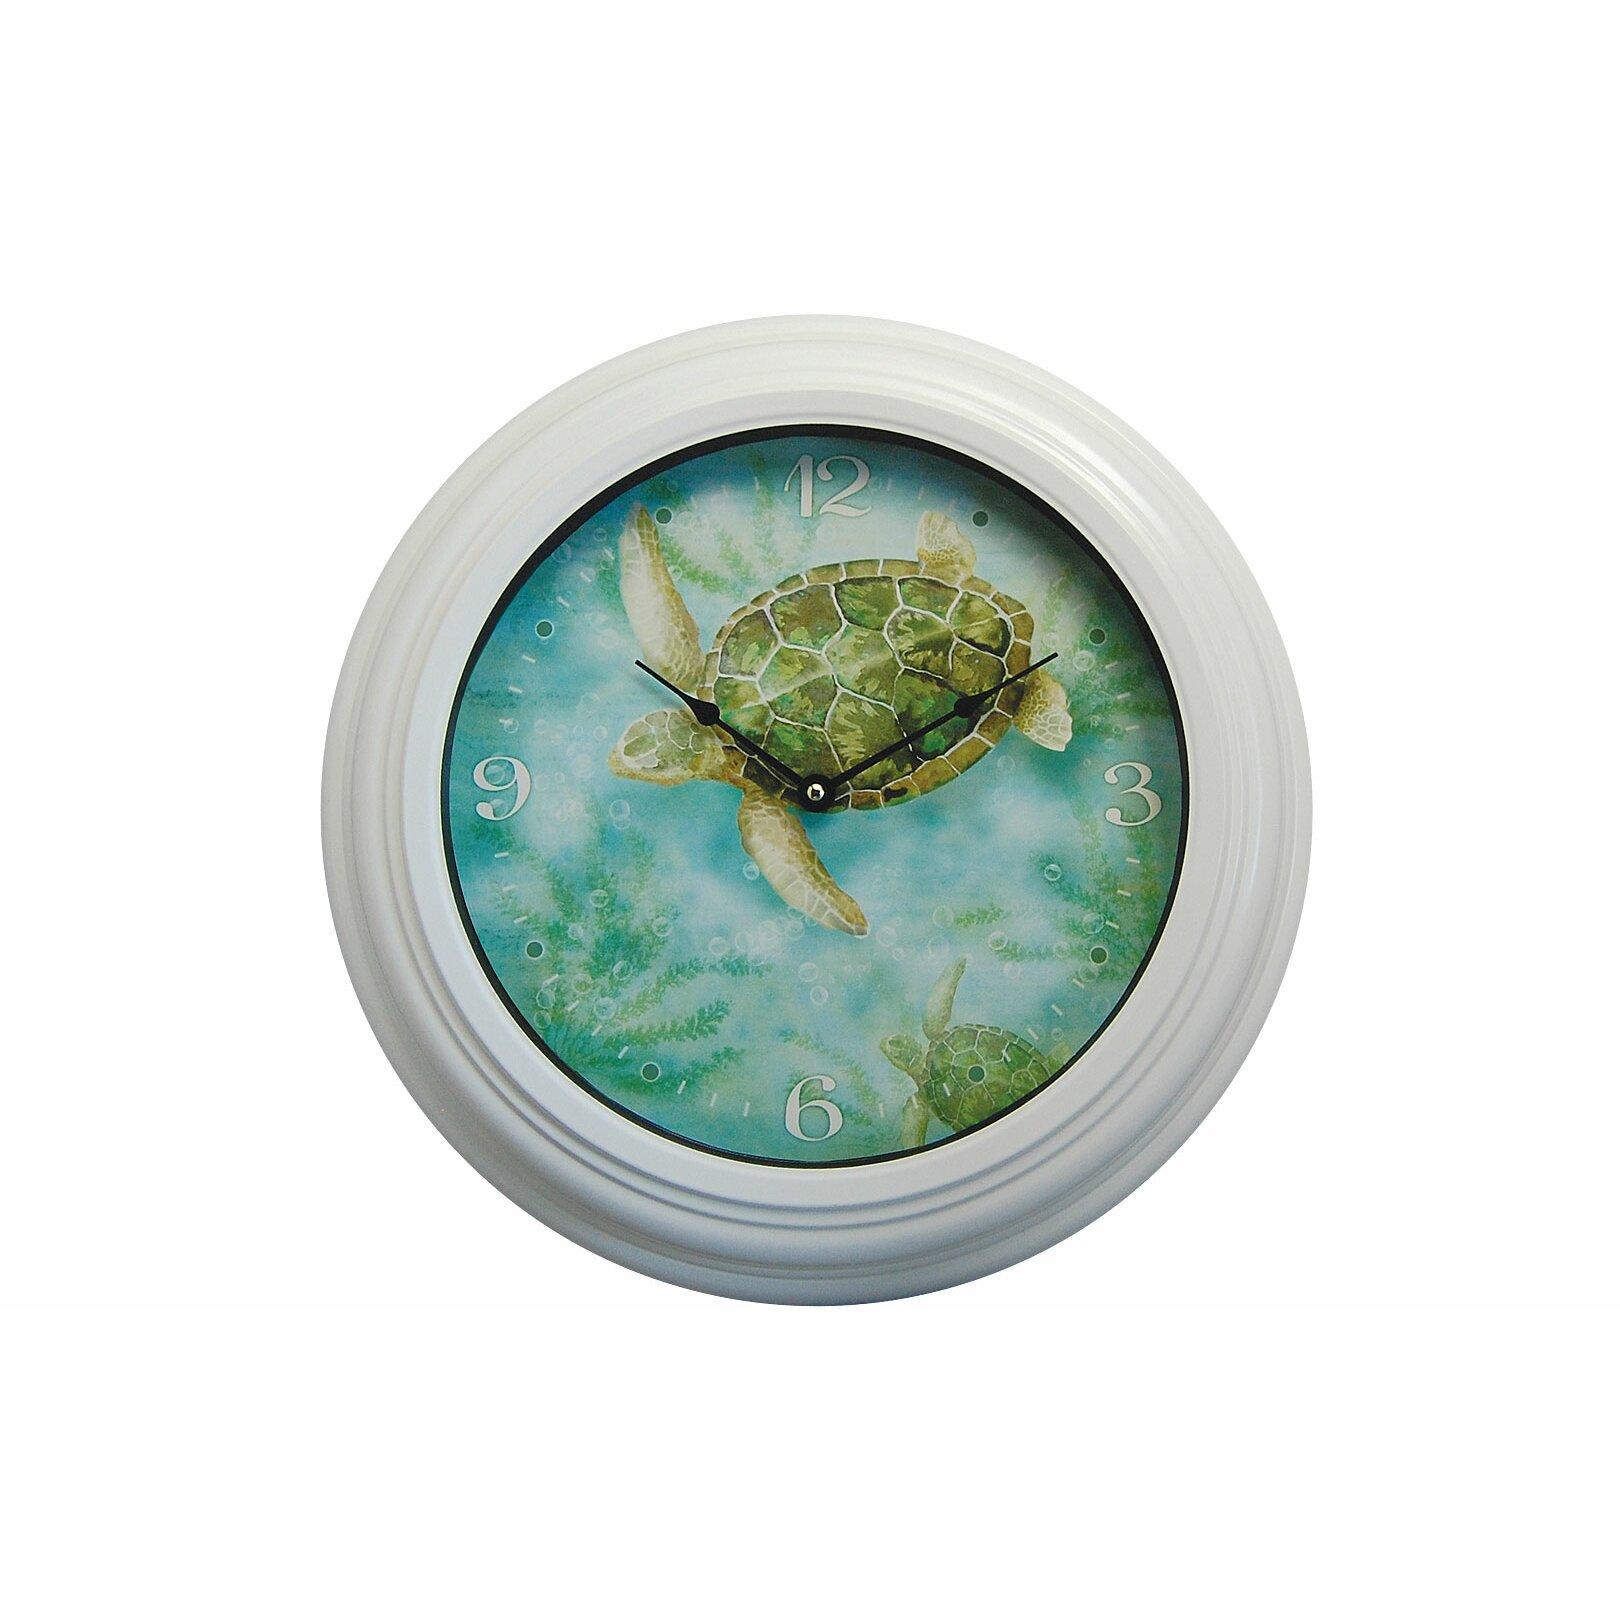 "Sea Life Turtle Wave Rug2 Bath Mat: Rightside Design I Sea Life 19"" Sea Turtle Wall Clock"